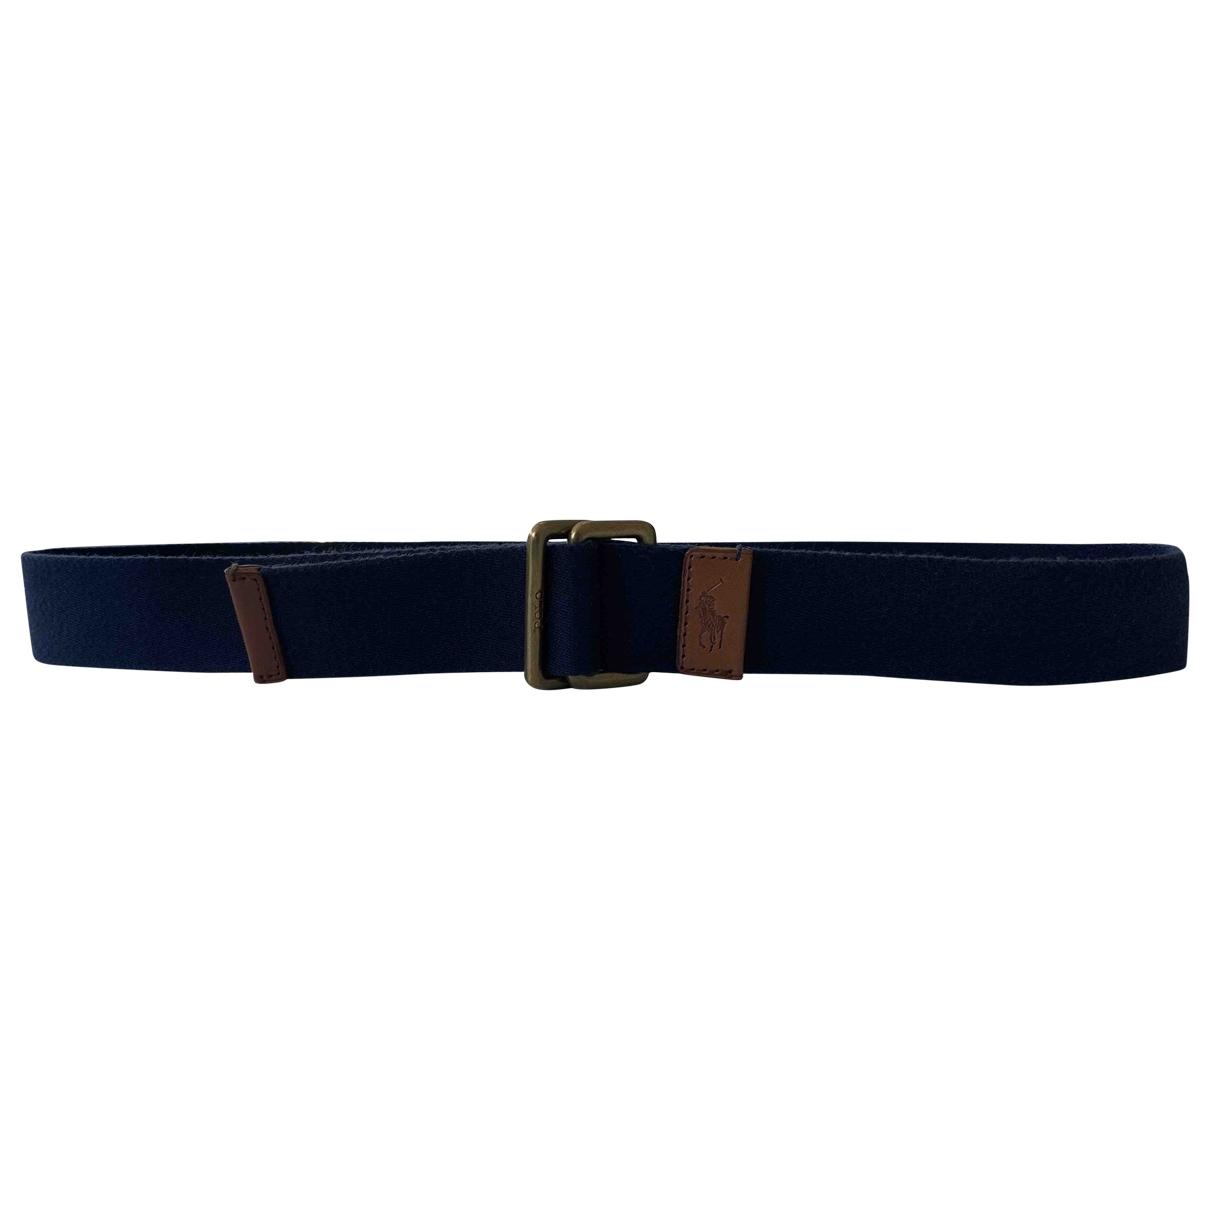 Polo Ralph Lauren \N Blue Cloth belt for Men M international